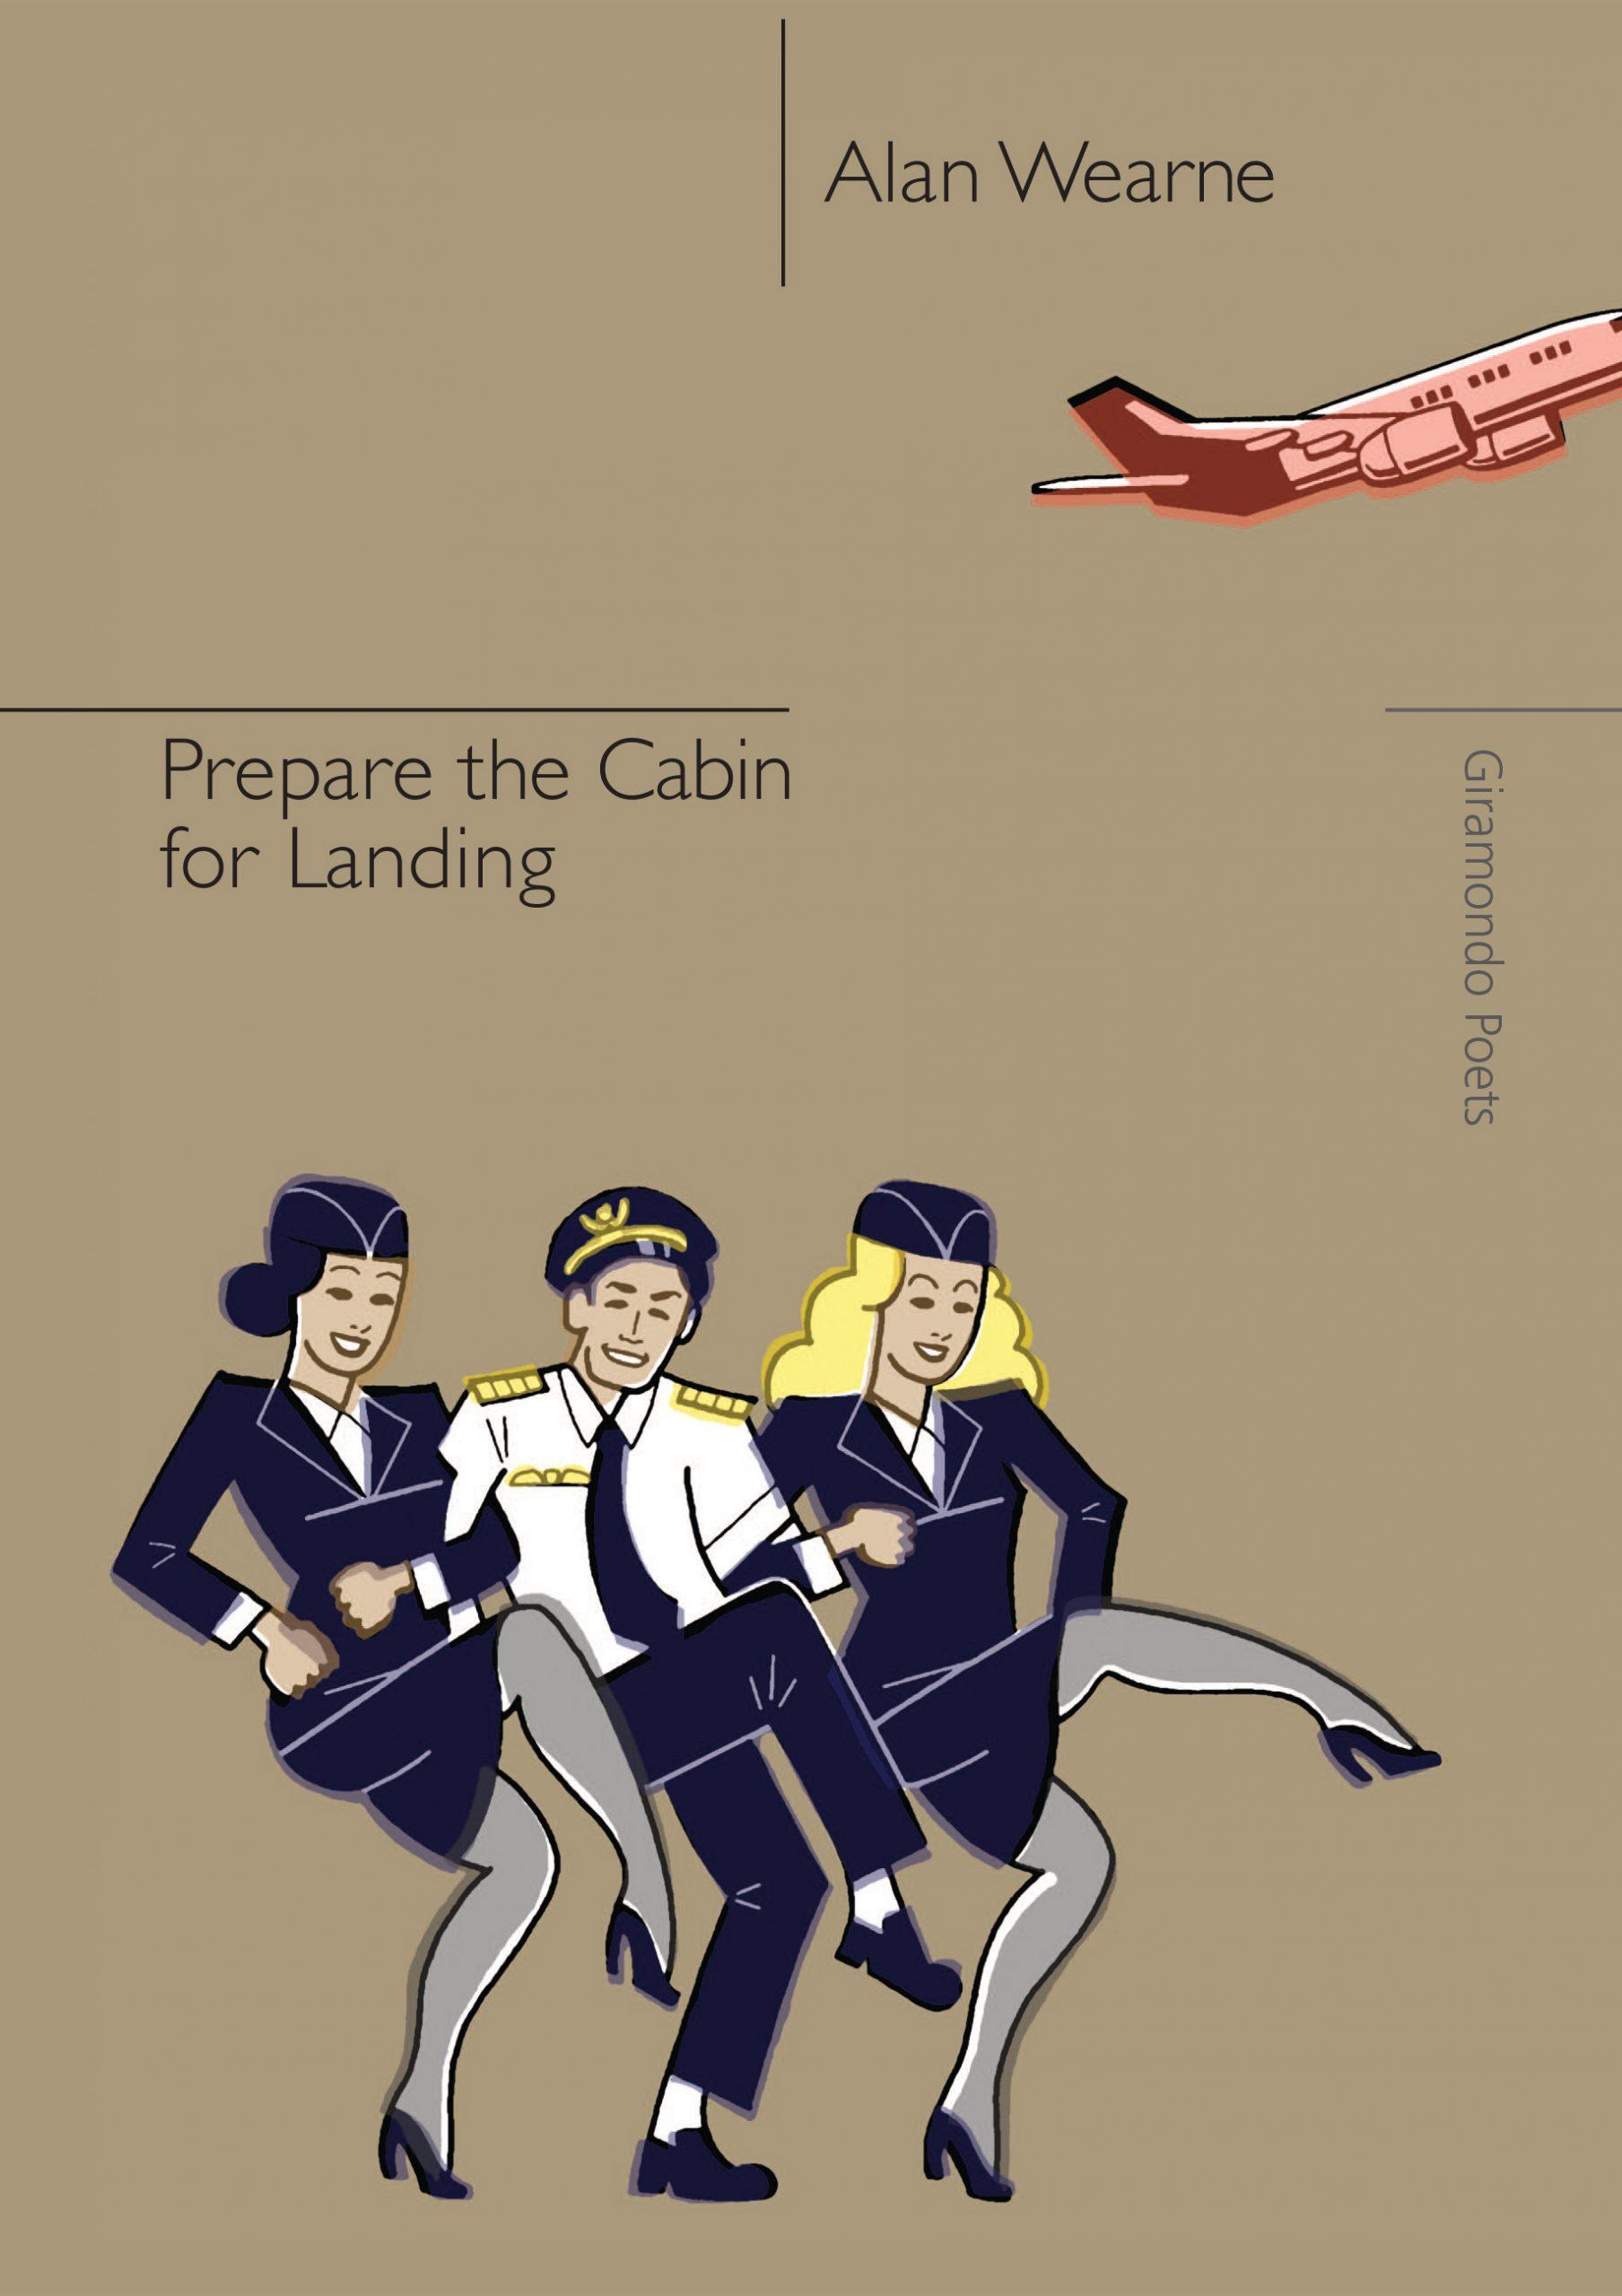 Prepare the Cabin for Landing